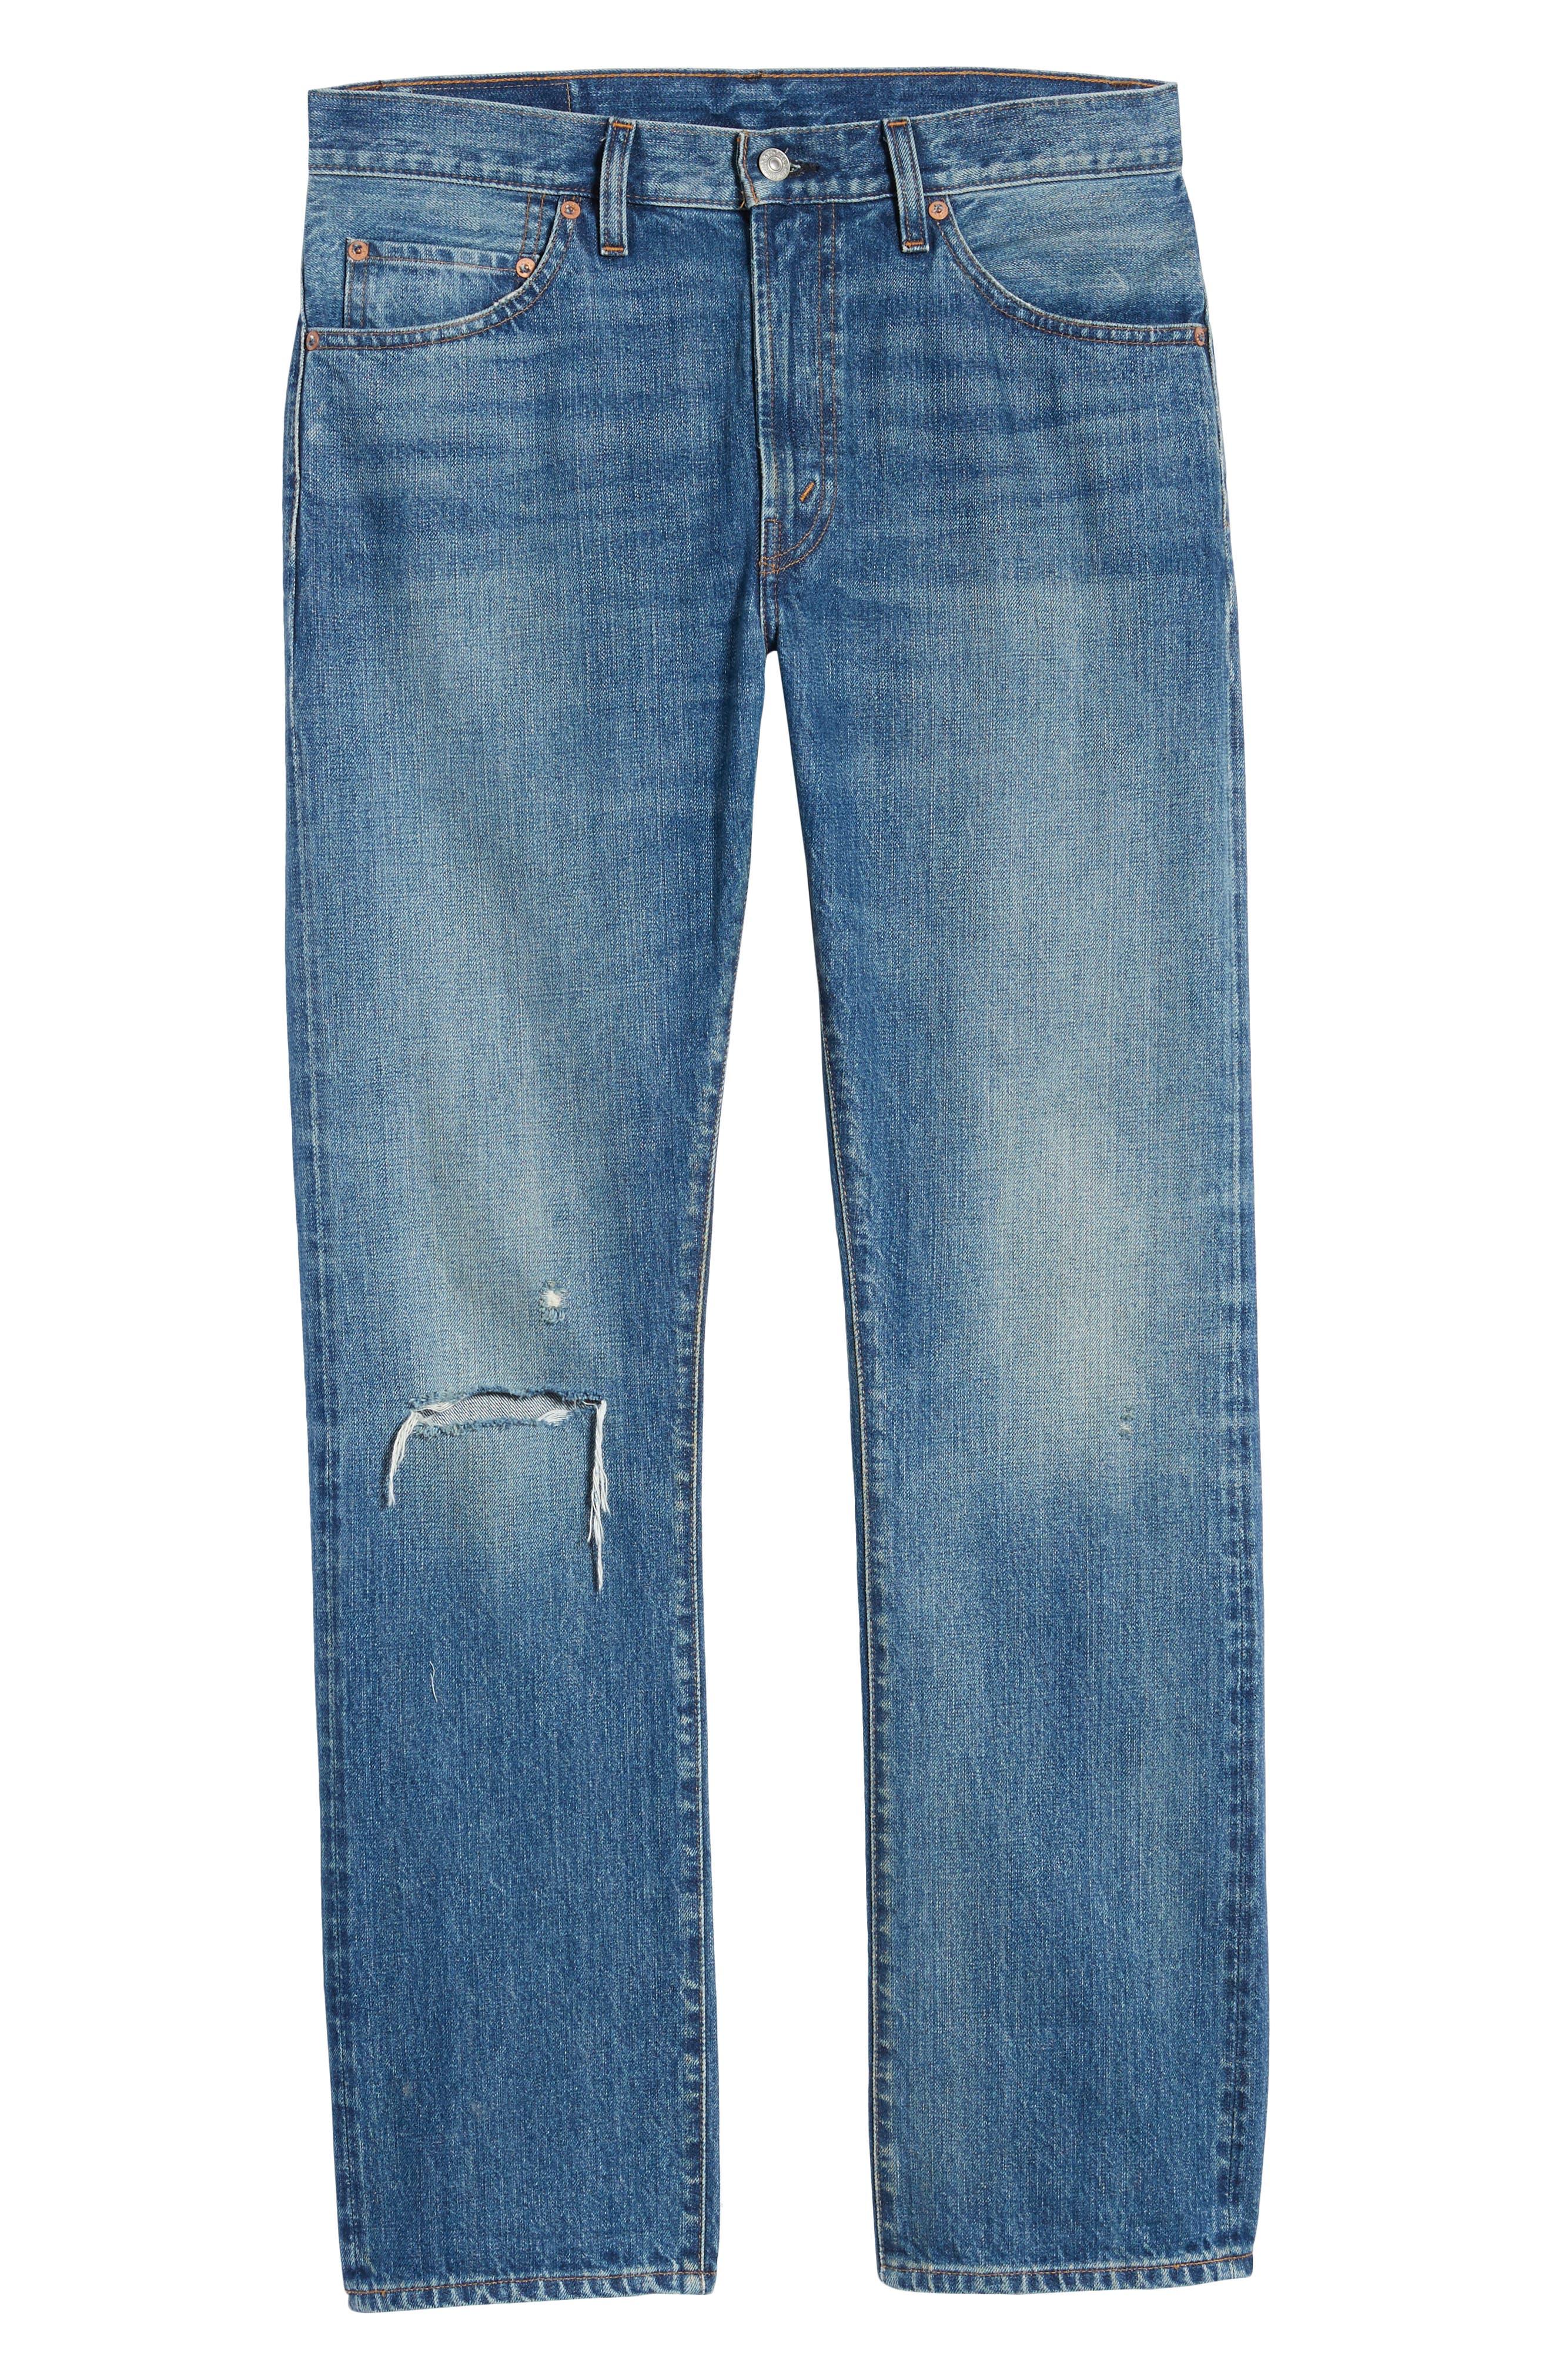 LEVI'S<SUP>®</SUP> VINTAGE CLOTHING, 1967 505<sup>™</sup> Slim Fit Selvedge Jeans, Alternate thumbnail 7, color, SPUTNIK